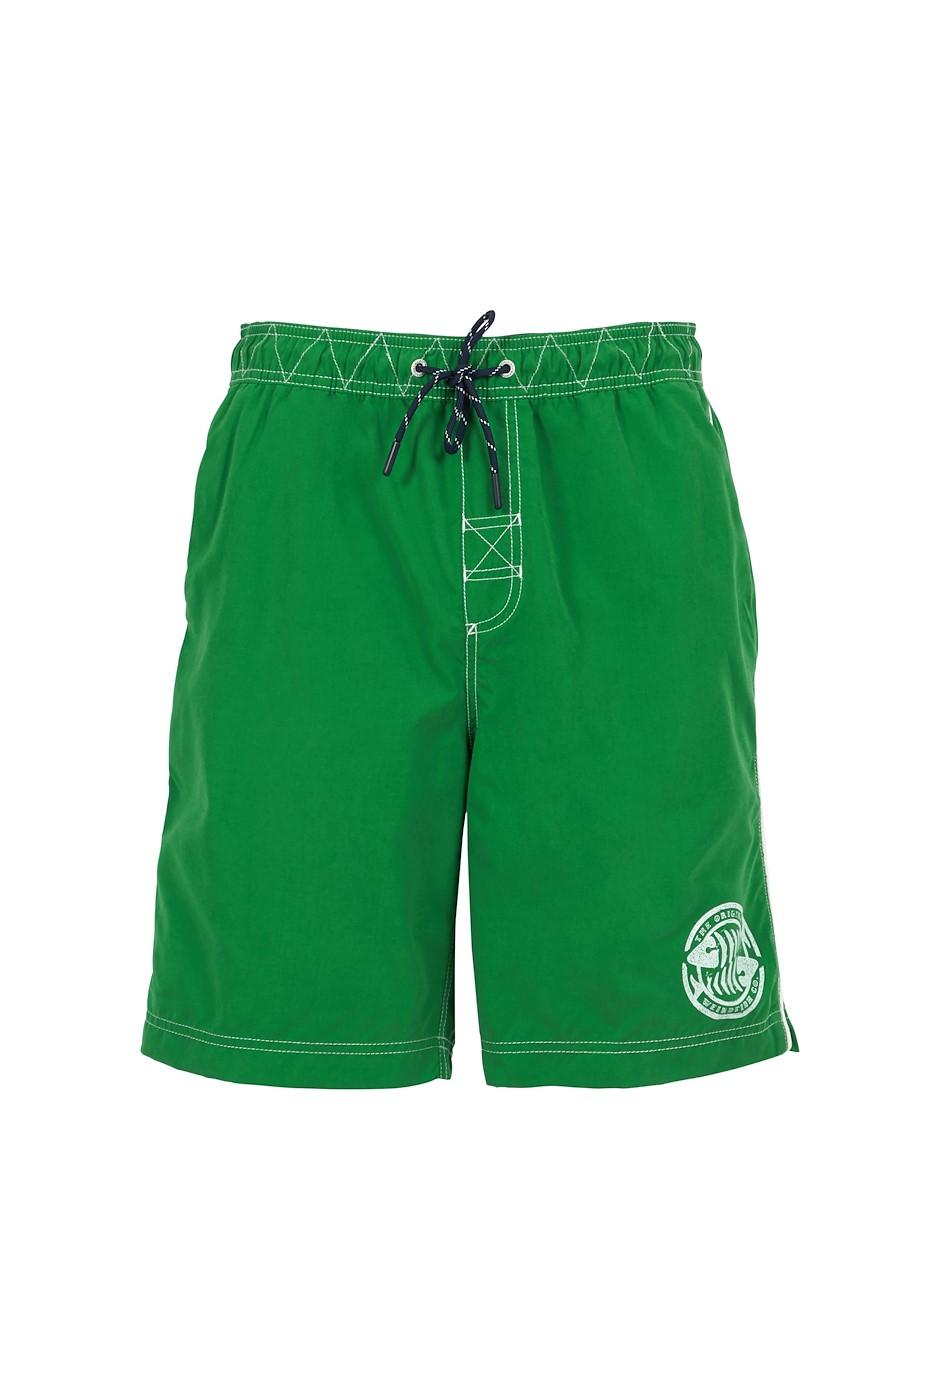 Cork Branded Board Shorts Frosty Spruce